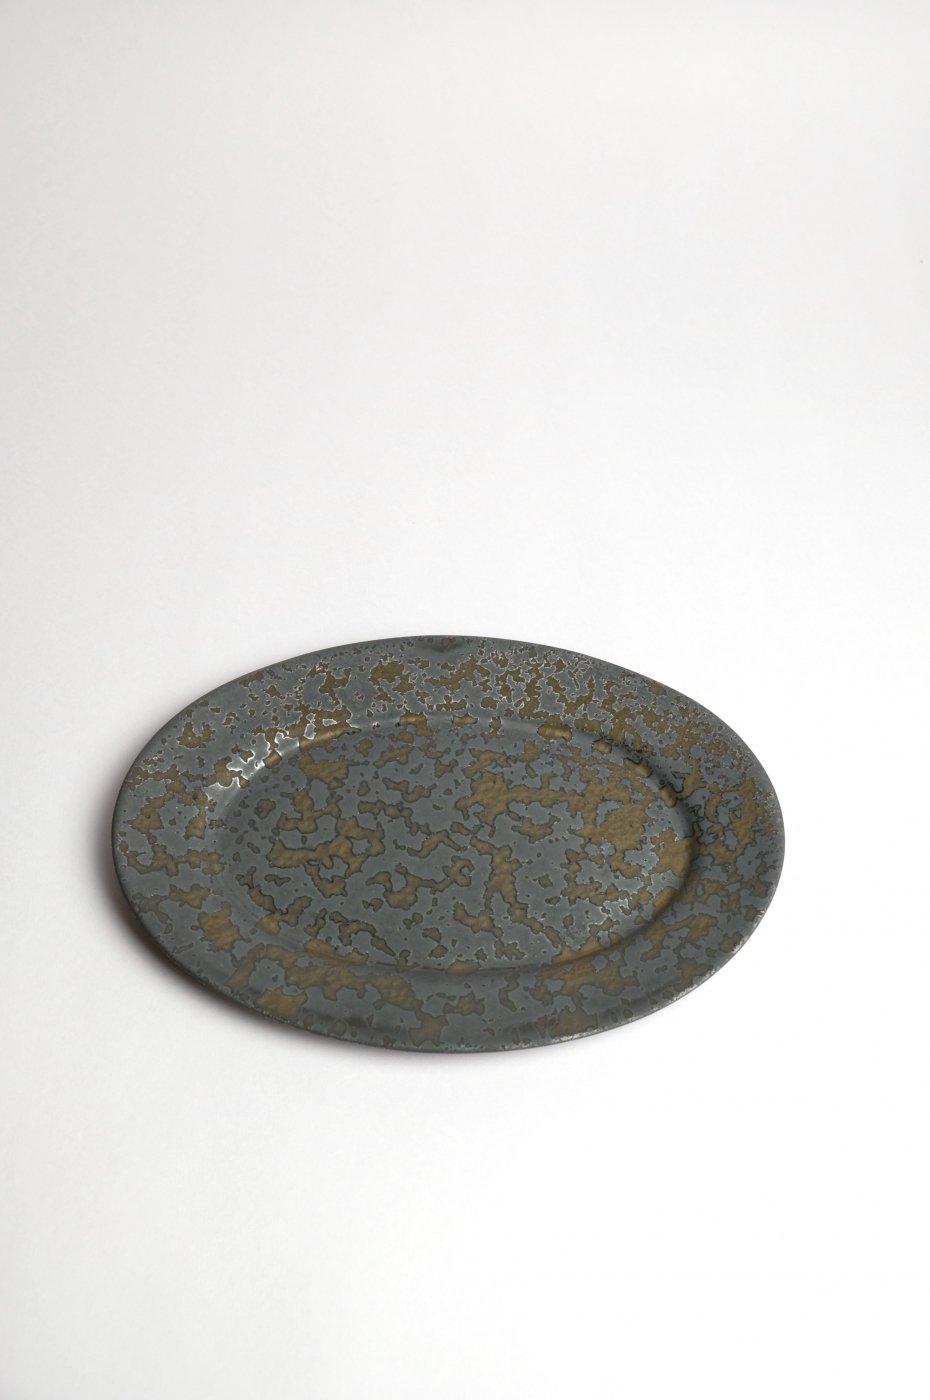 ONE KILN CERAMICS ワンキルン セラミックス -Oval Plate S-